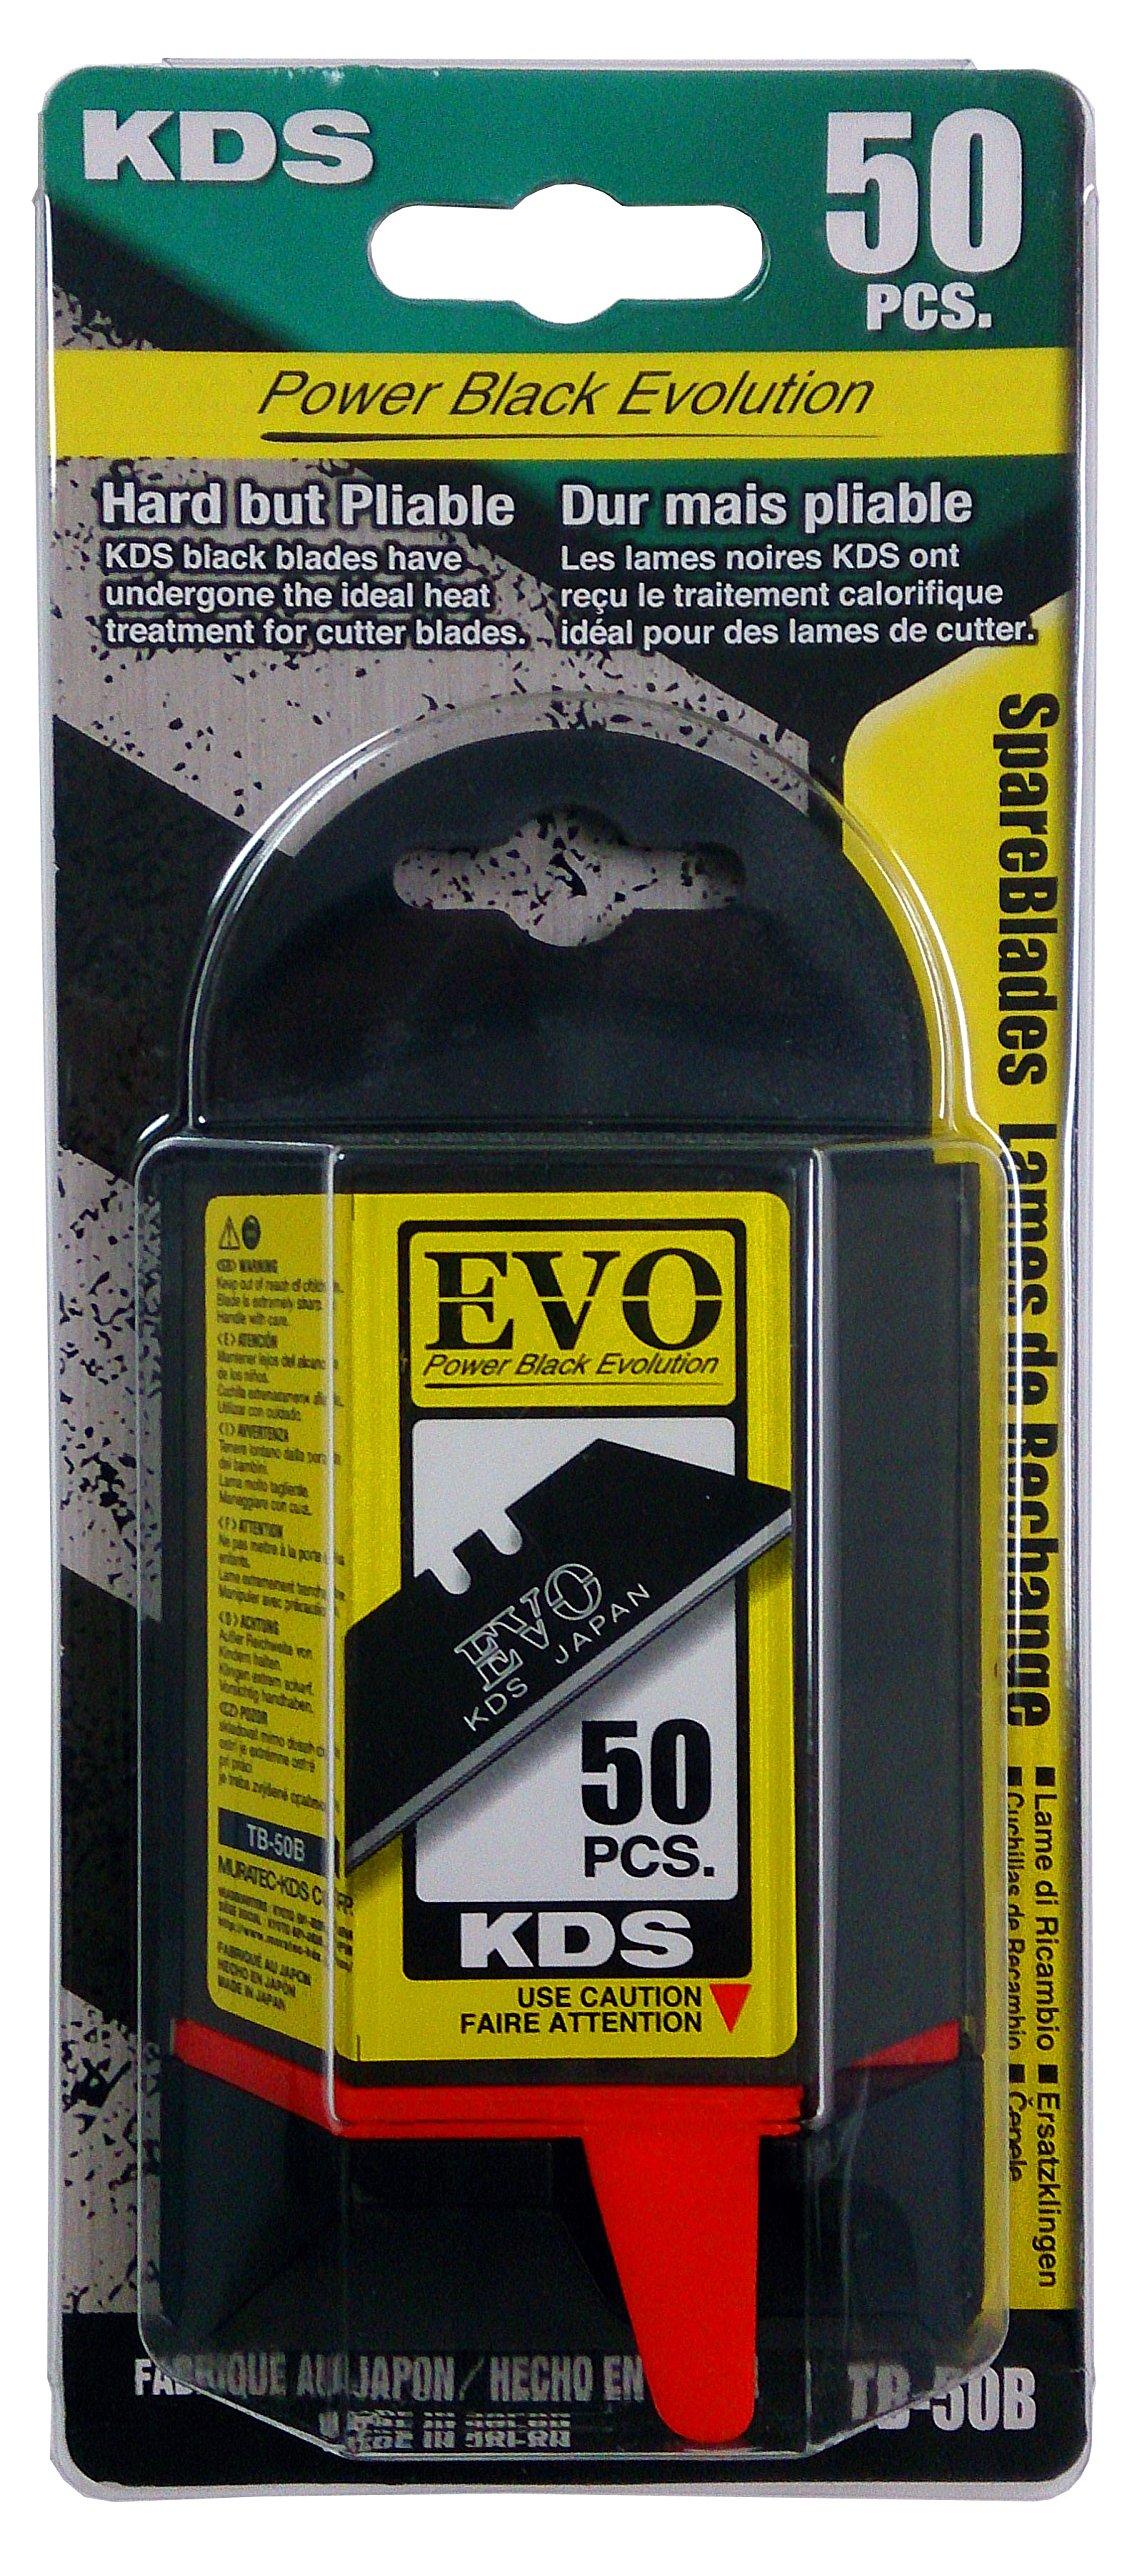 KDS TB-50B EVO High-Tempered Trapezoid Utility Knife Blades, Black